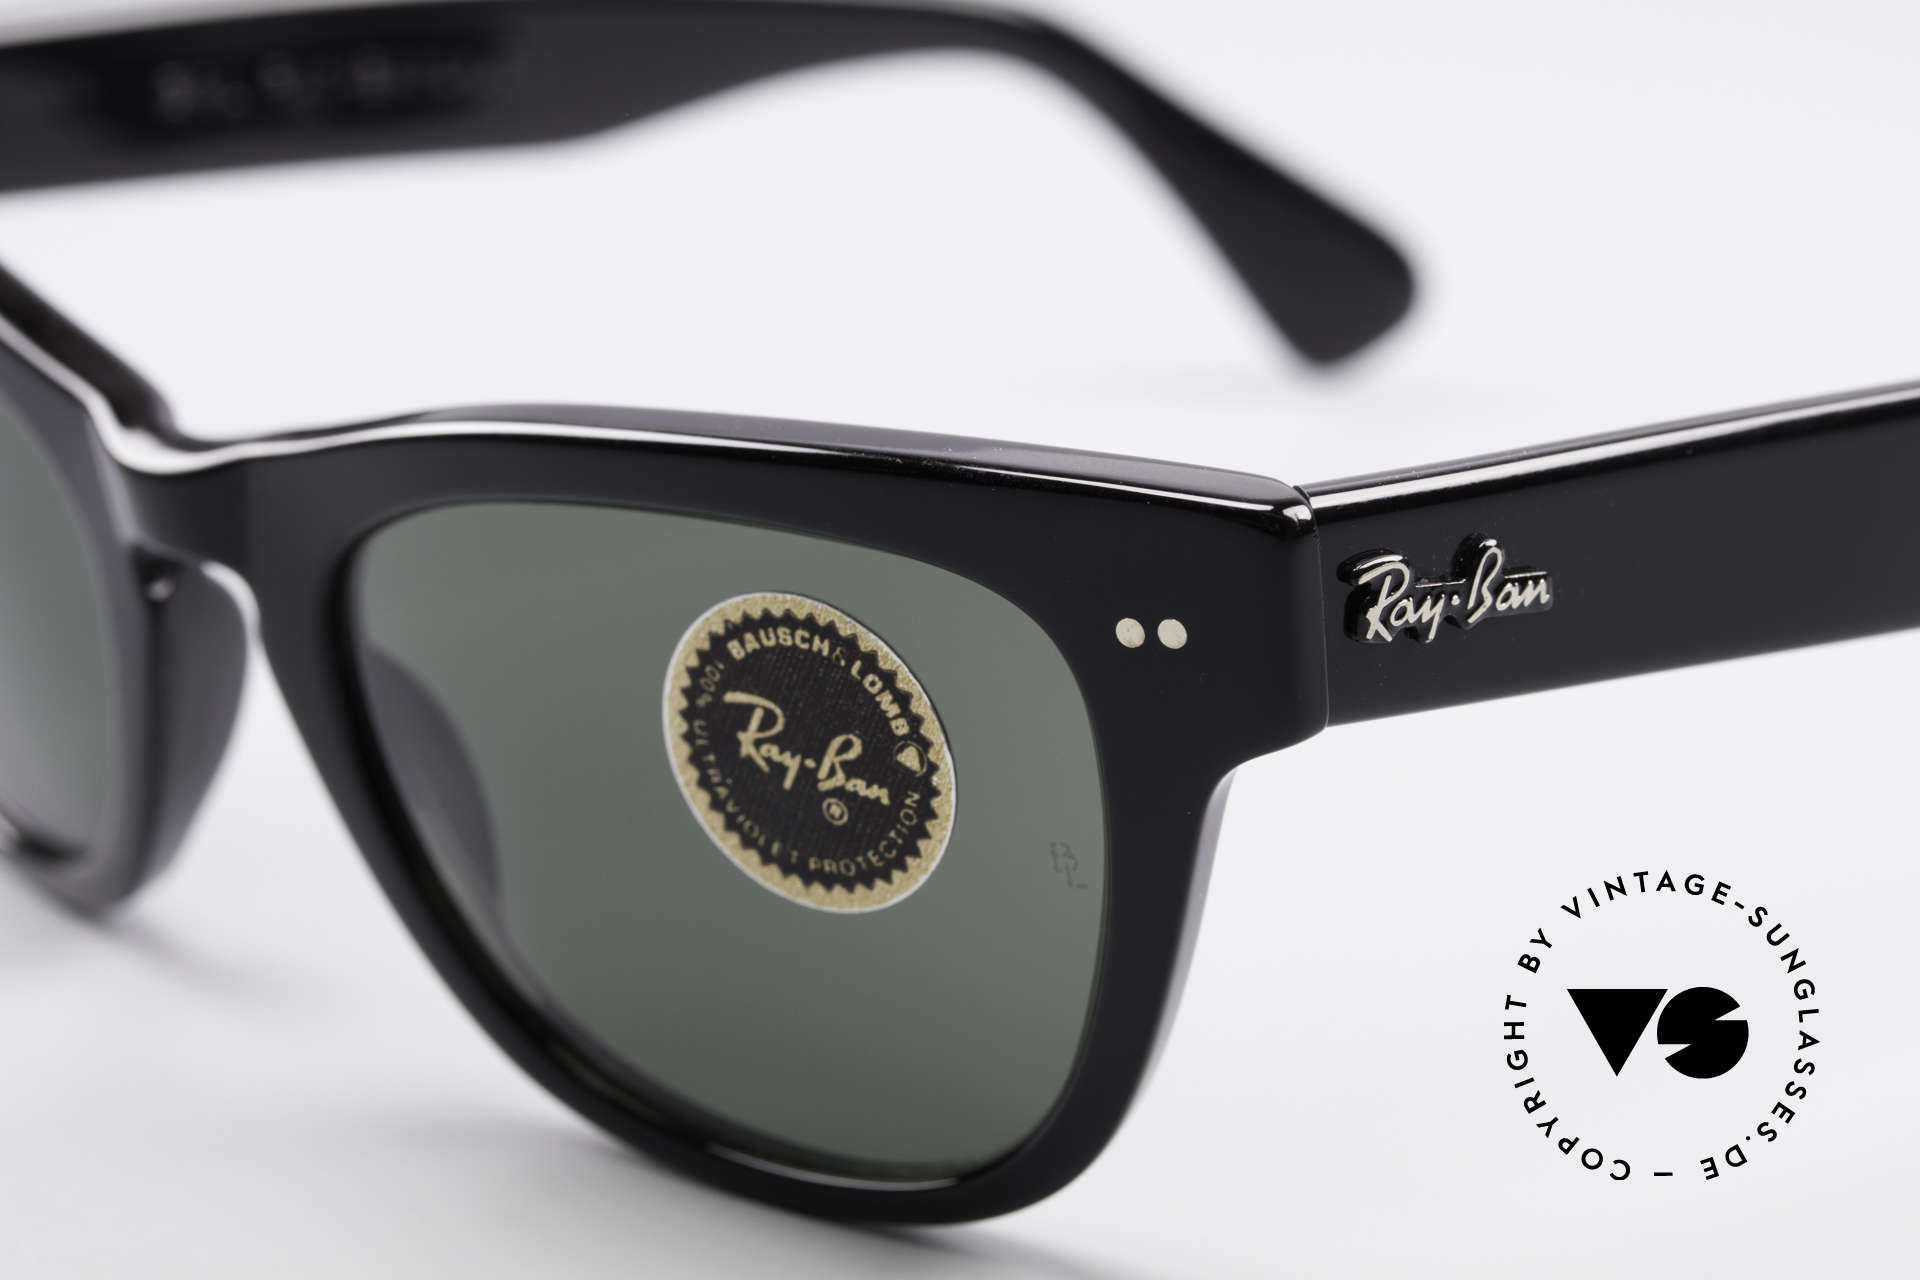 Ray Ban Laramie B&L Vintage Ladies Sunglasses, unworn (like all our vintage RAY-BAN sunglasses), Made for Women